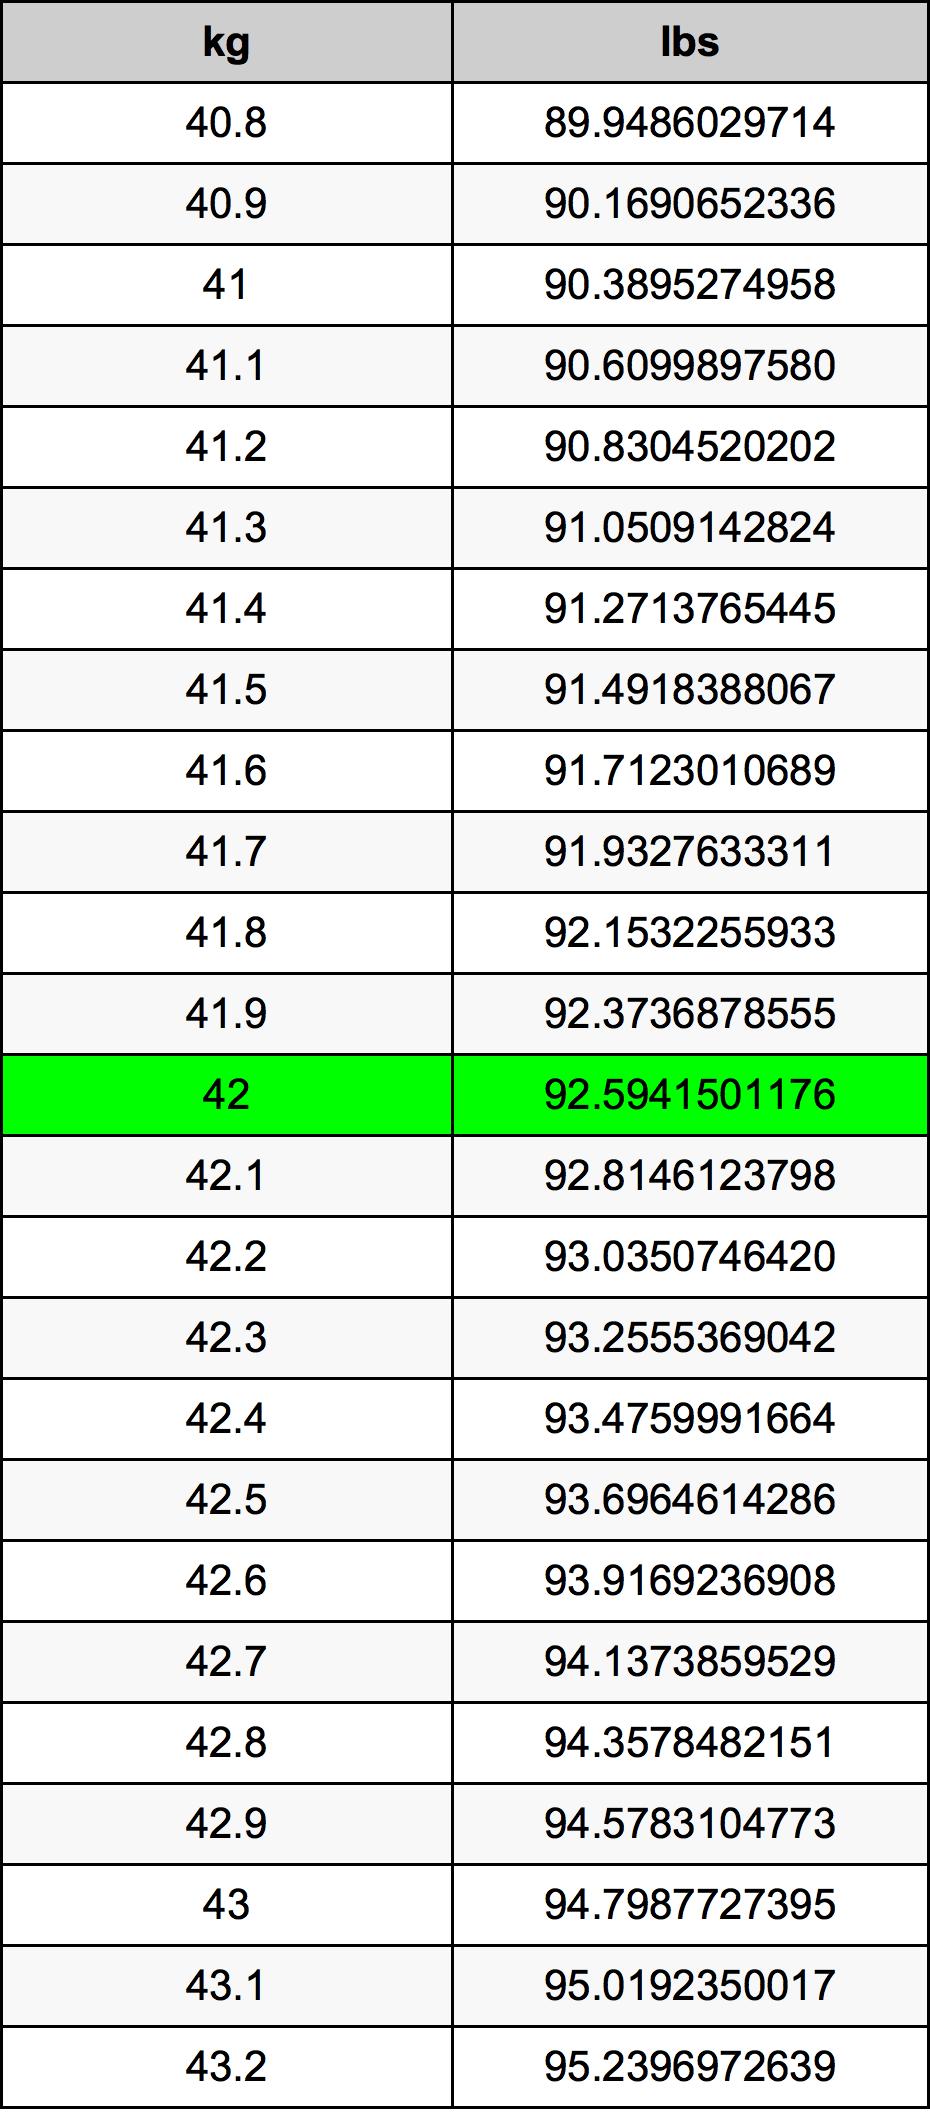 42 Kilograms To Pounds Converter 42 Kg To Lbs Converter